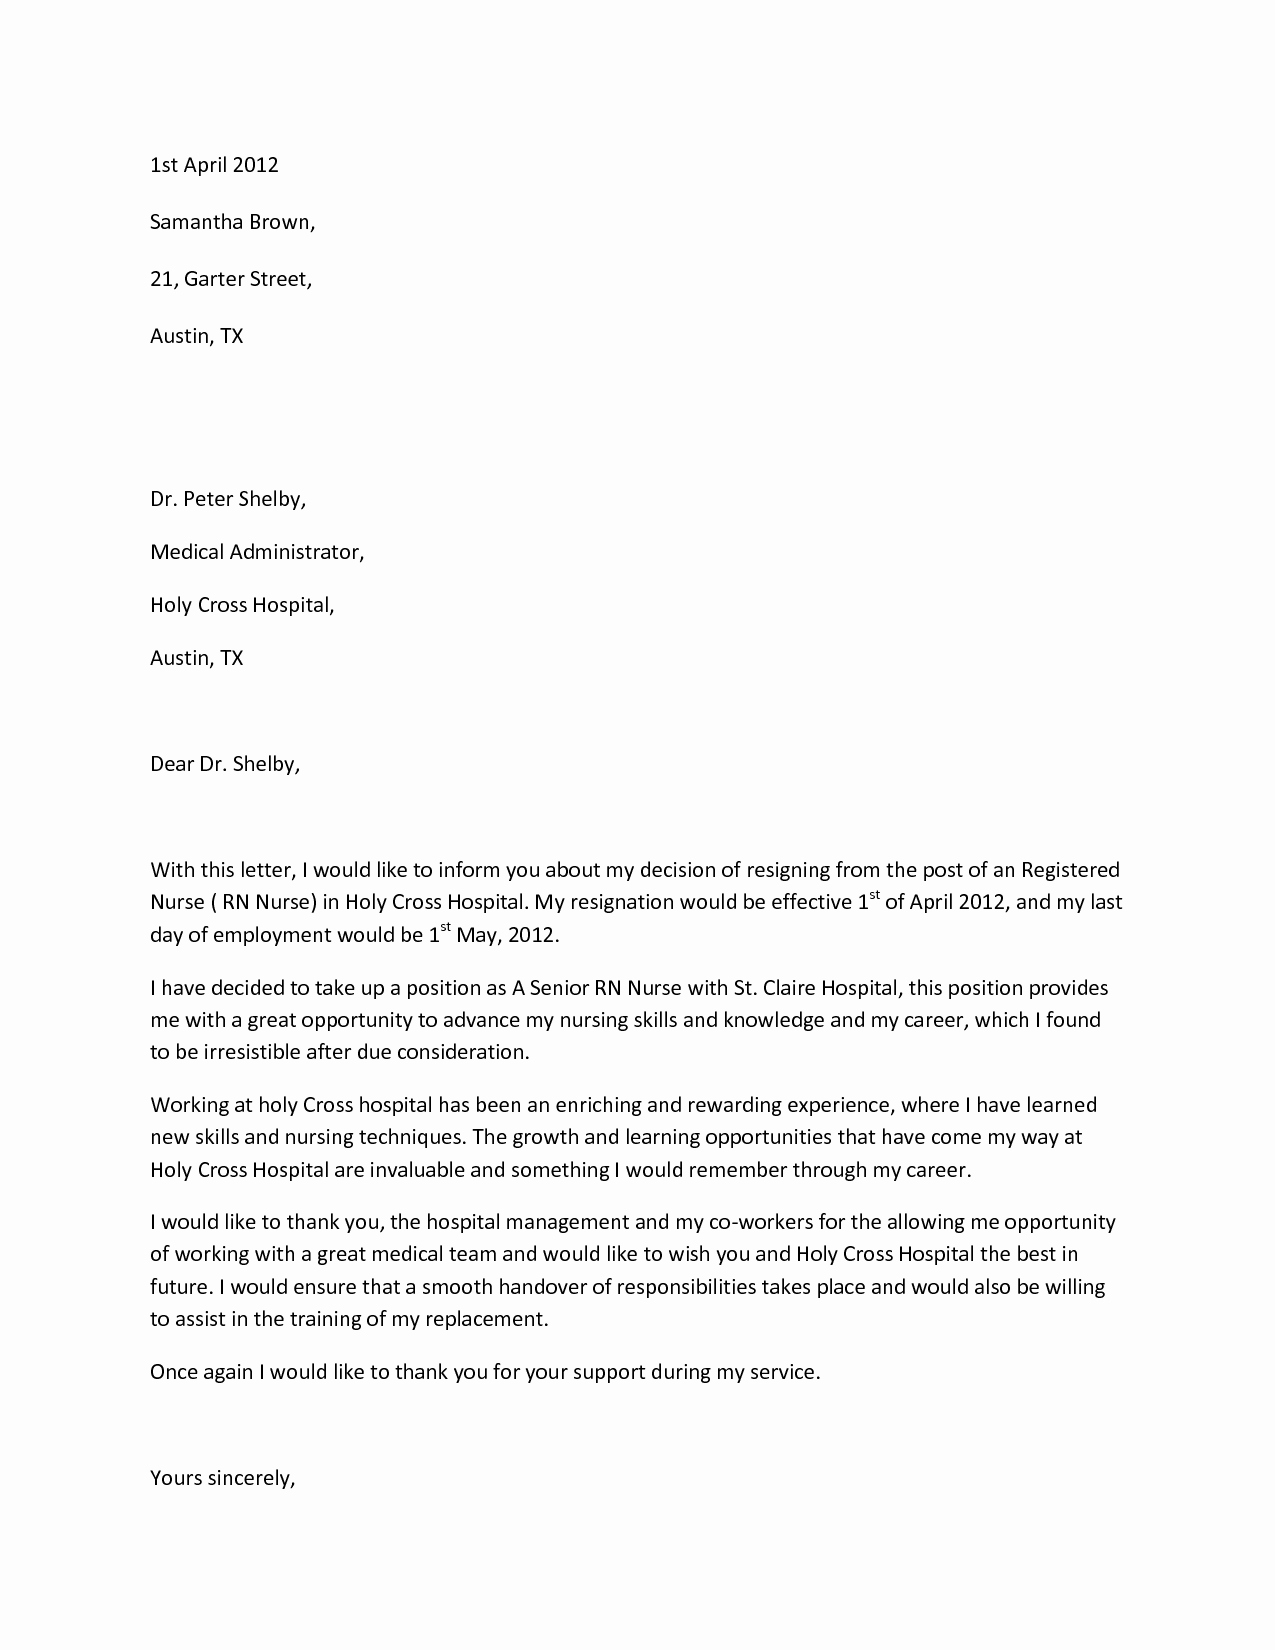 Registered Nurse Resignation Letter Inspirational Sample Resignation Letterwriting A Letter Resignation Email Letter Sample